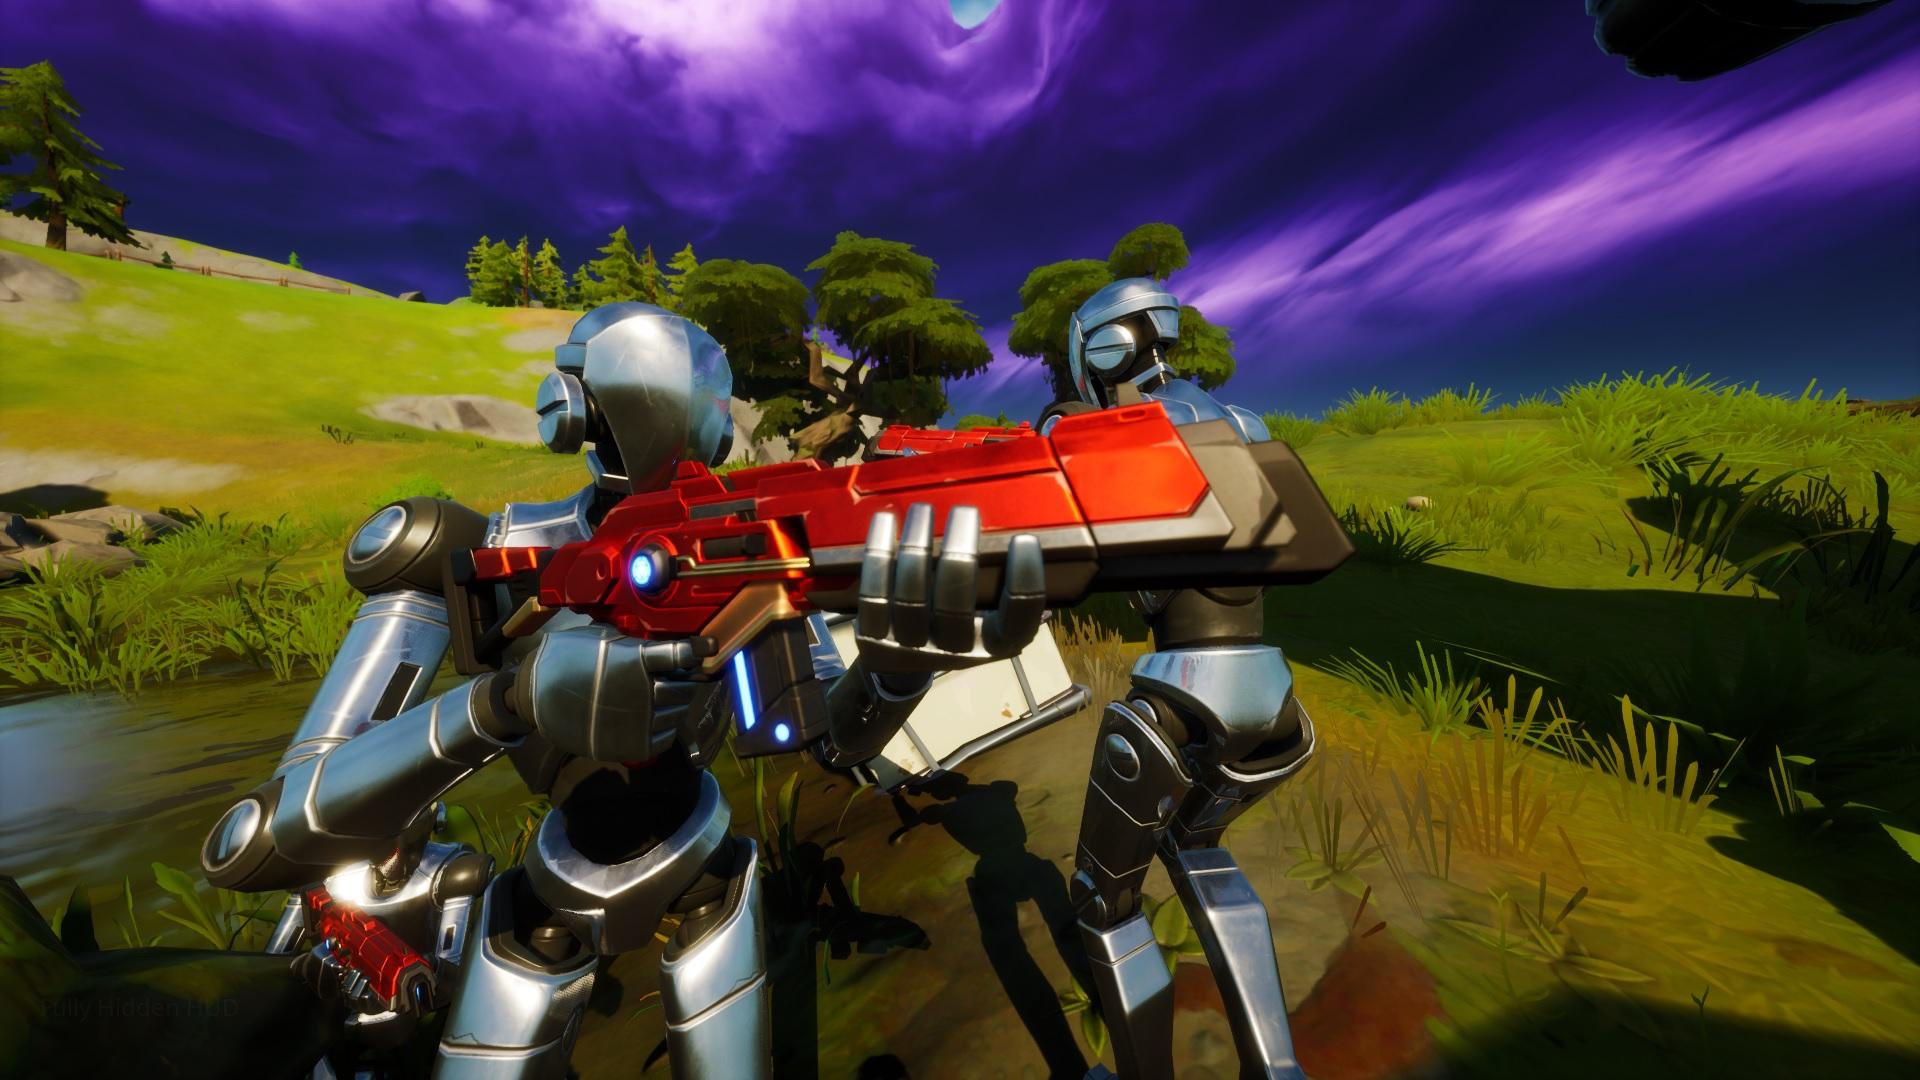 Fortnite Season 4 Mythic Weapon Locations Pc Gamer